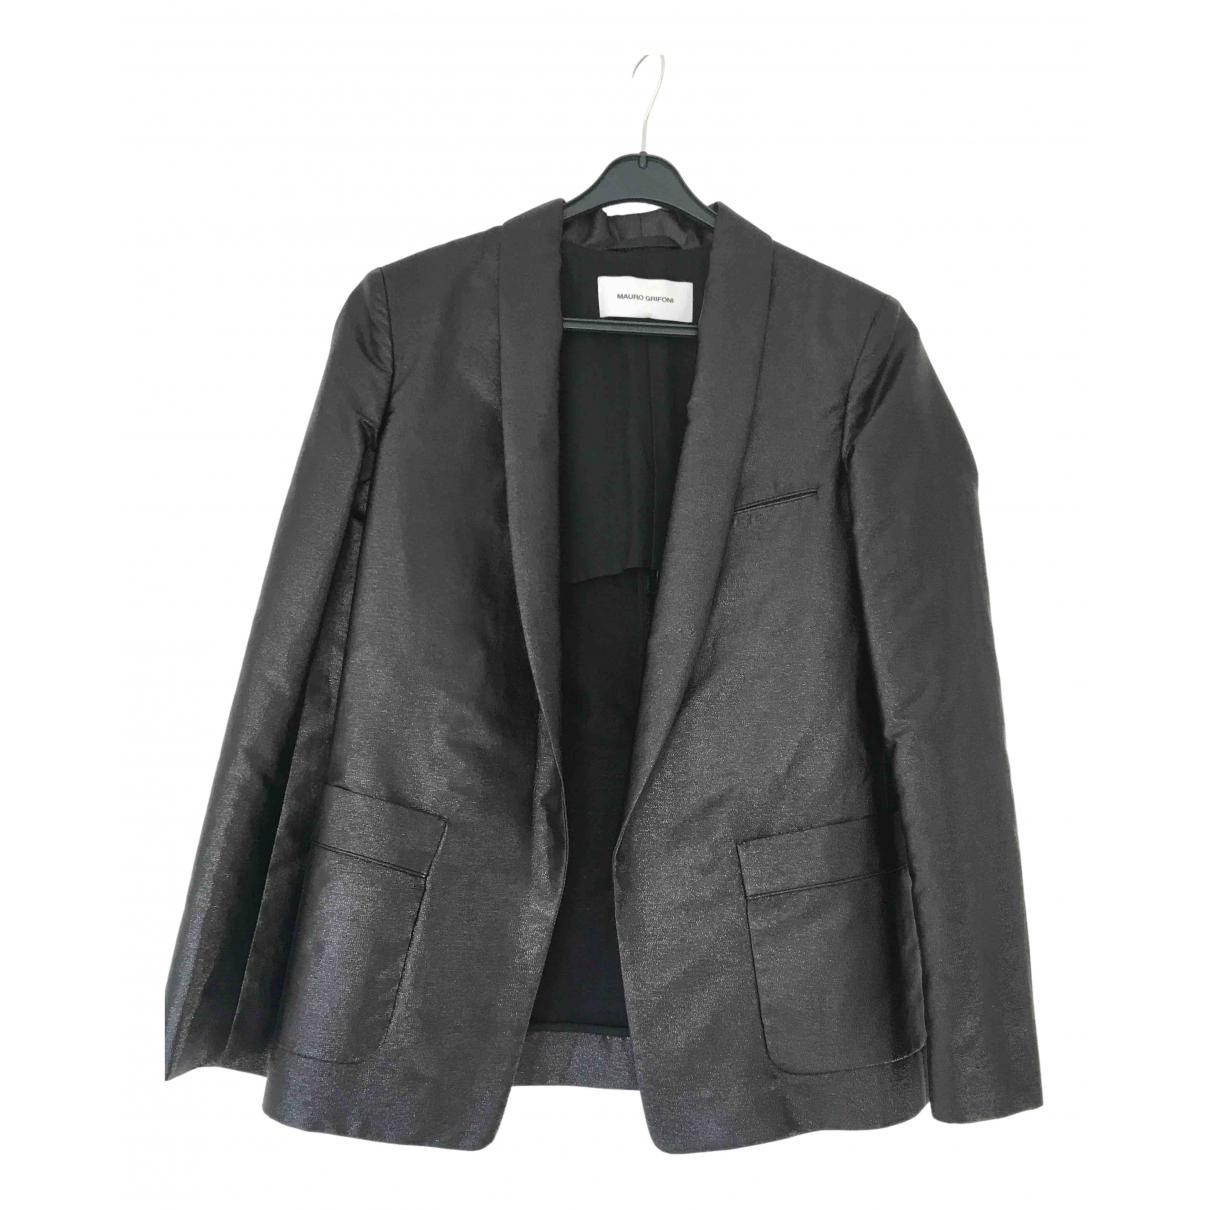 Mauro Grifoni \N Black Cotton jacket for Women 40 IT